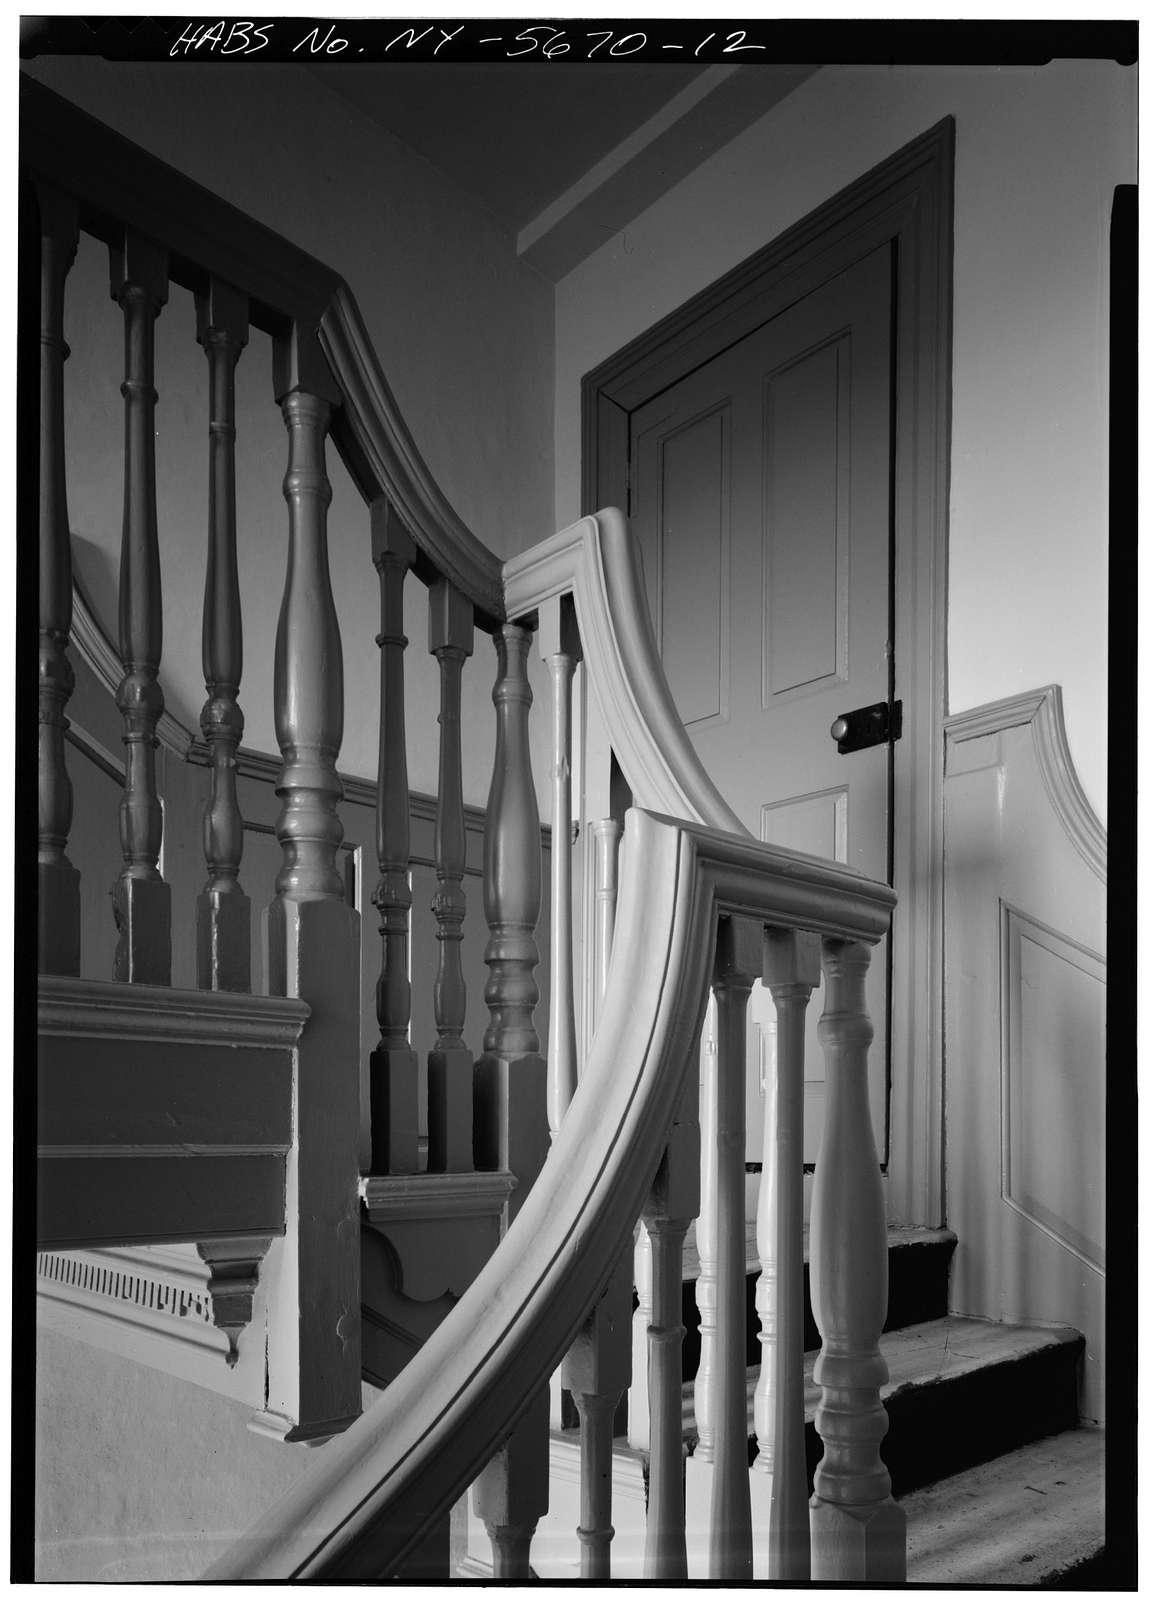 Joseph Lloyd Manor House, Lloyd Harbor Road & Lloyd Lane, Lloyd Harbor, Suffolk County, NY